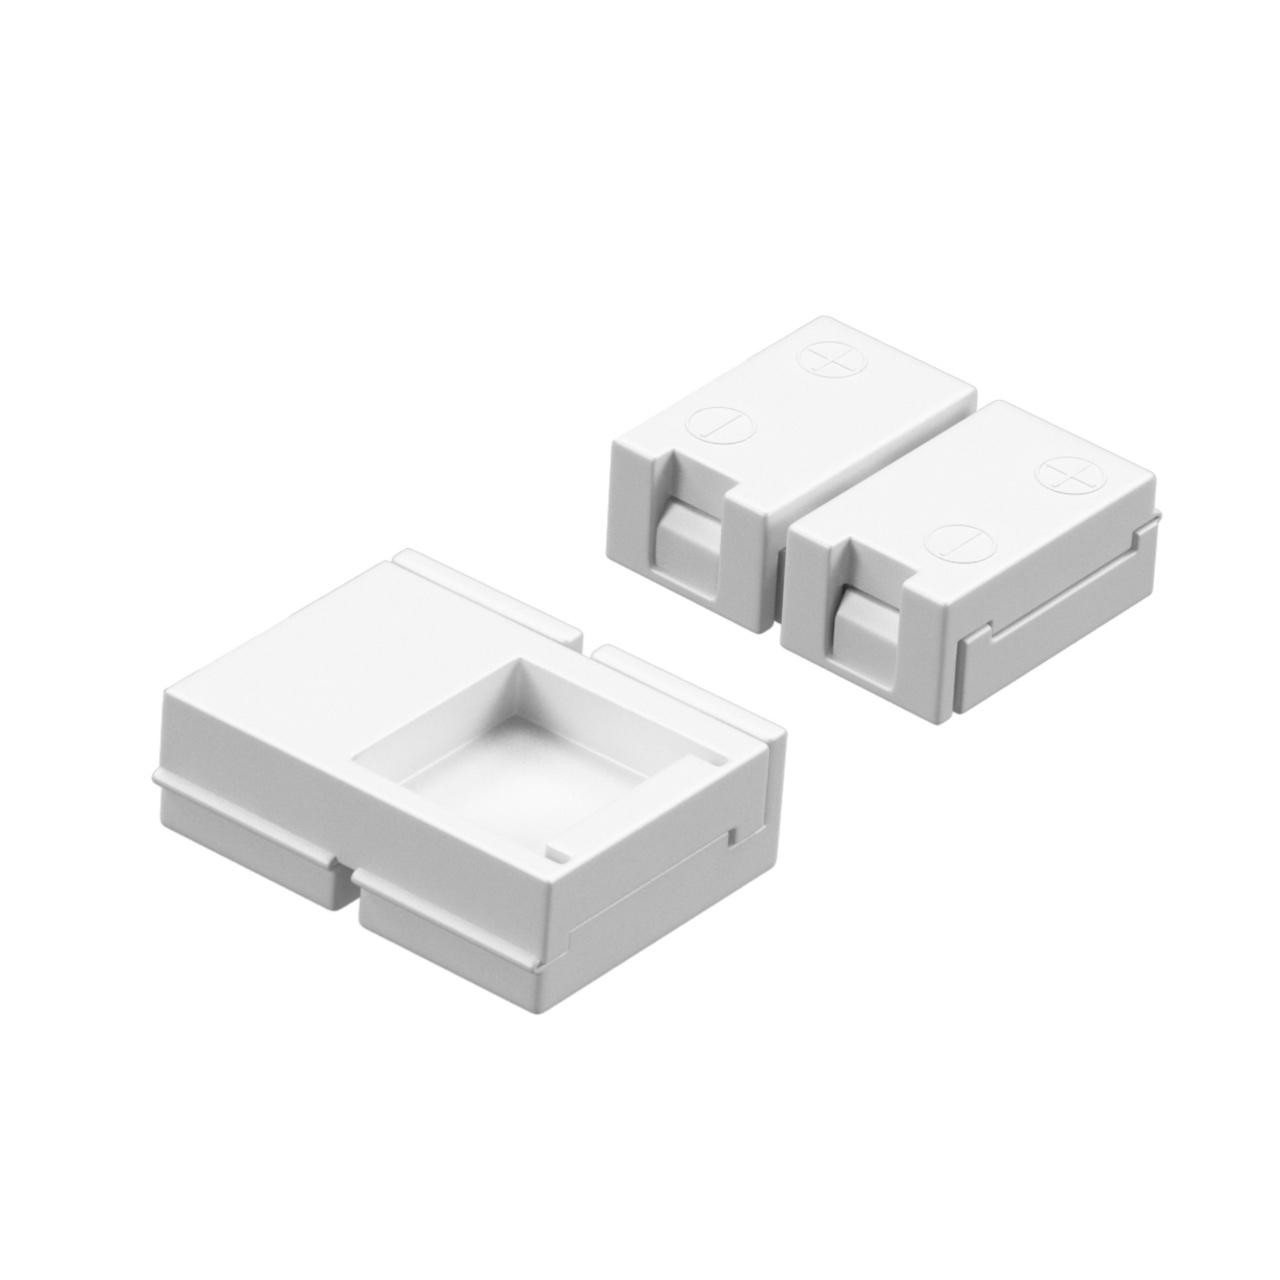 Соединитель жесткий для ленты 12V 3528LED 40000Х-40001Х Lightstar 408080